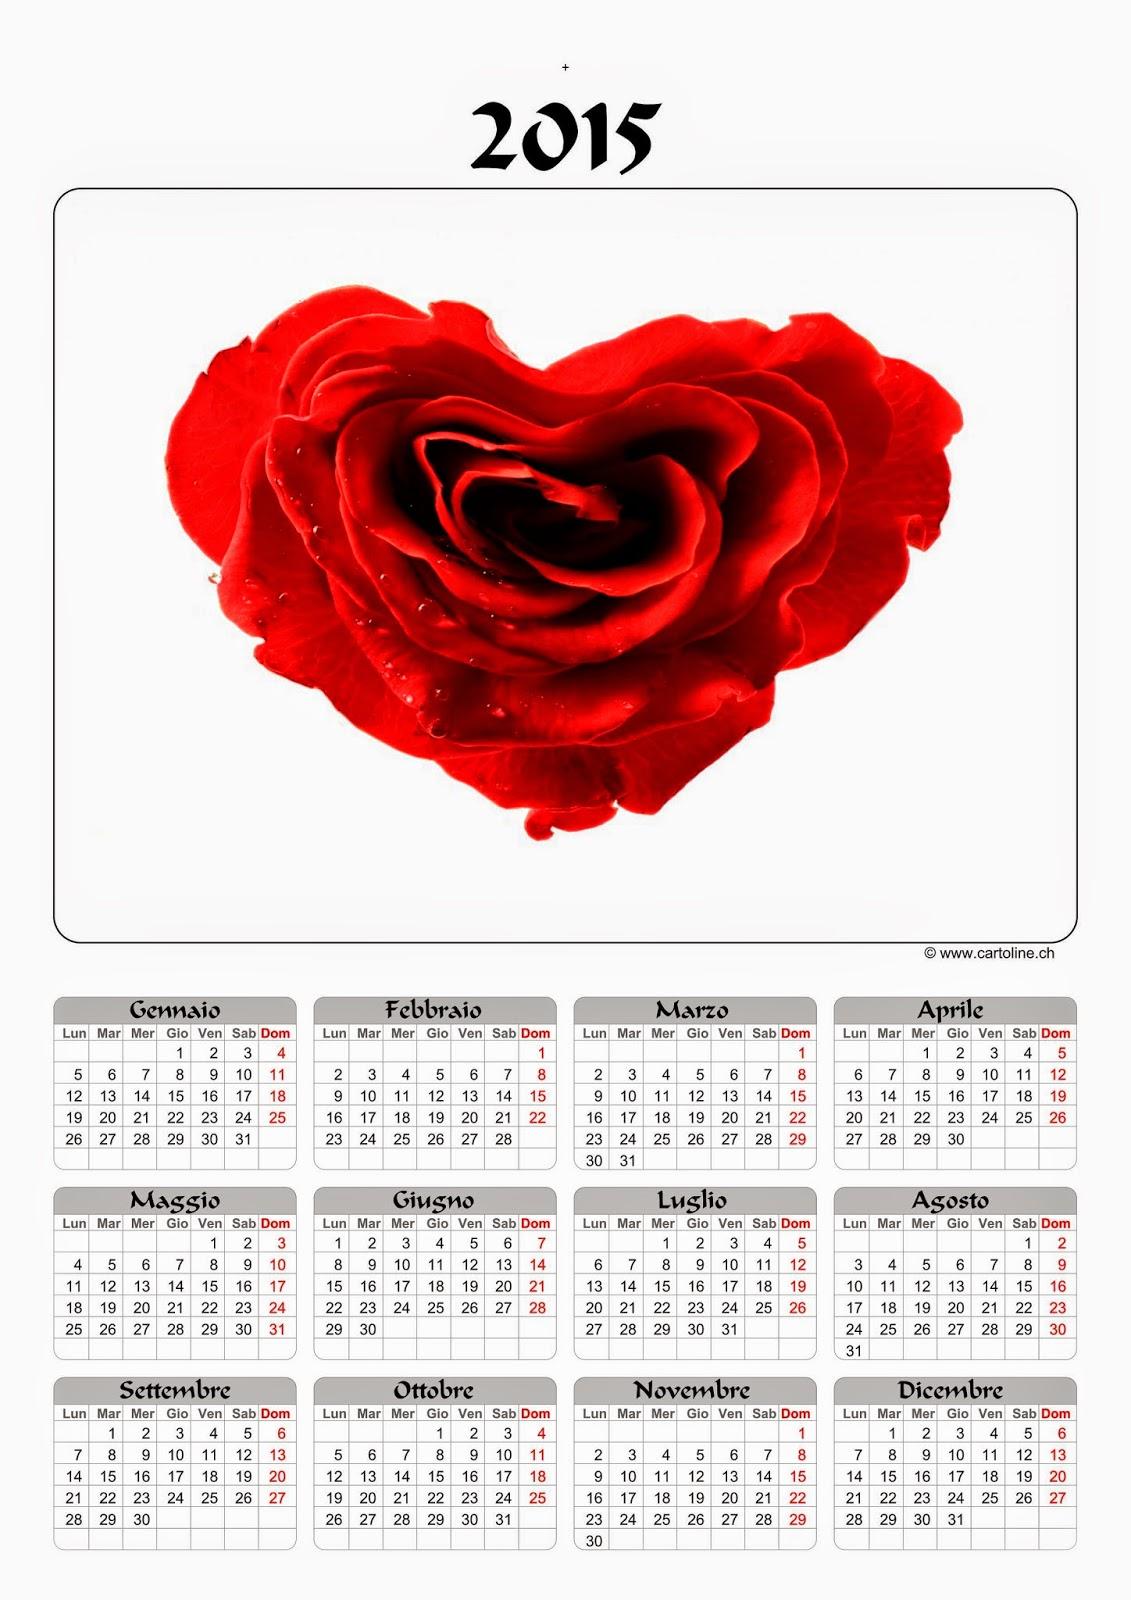 Cartoline Ch Calendario.Appuntinternauta59 Stampa Gratis Il Tuo Calendario 2015